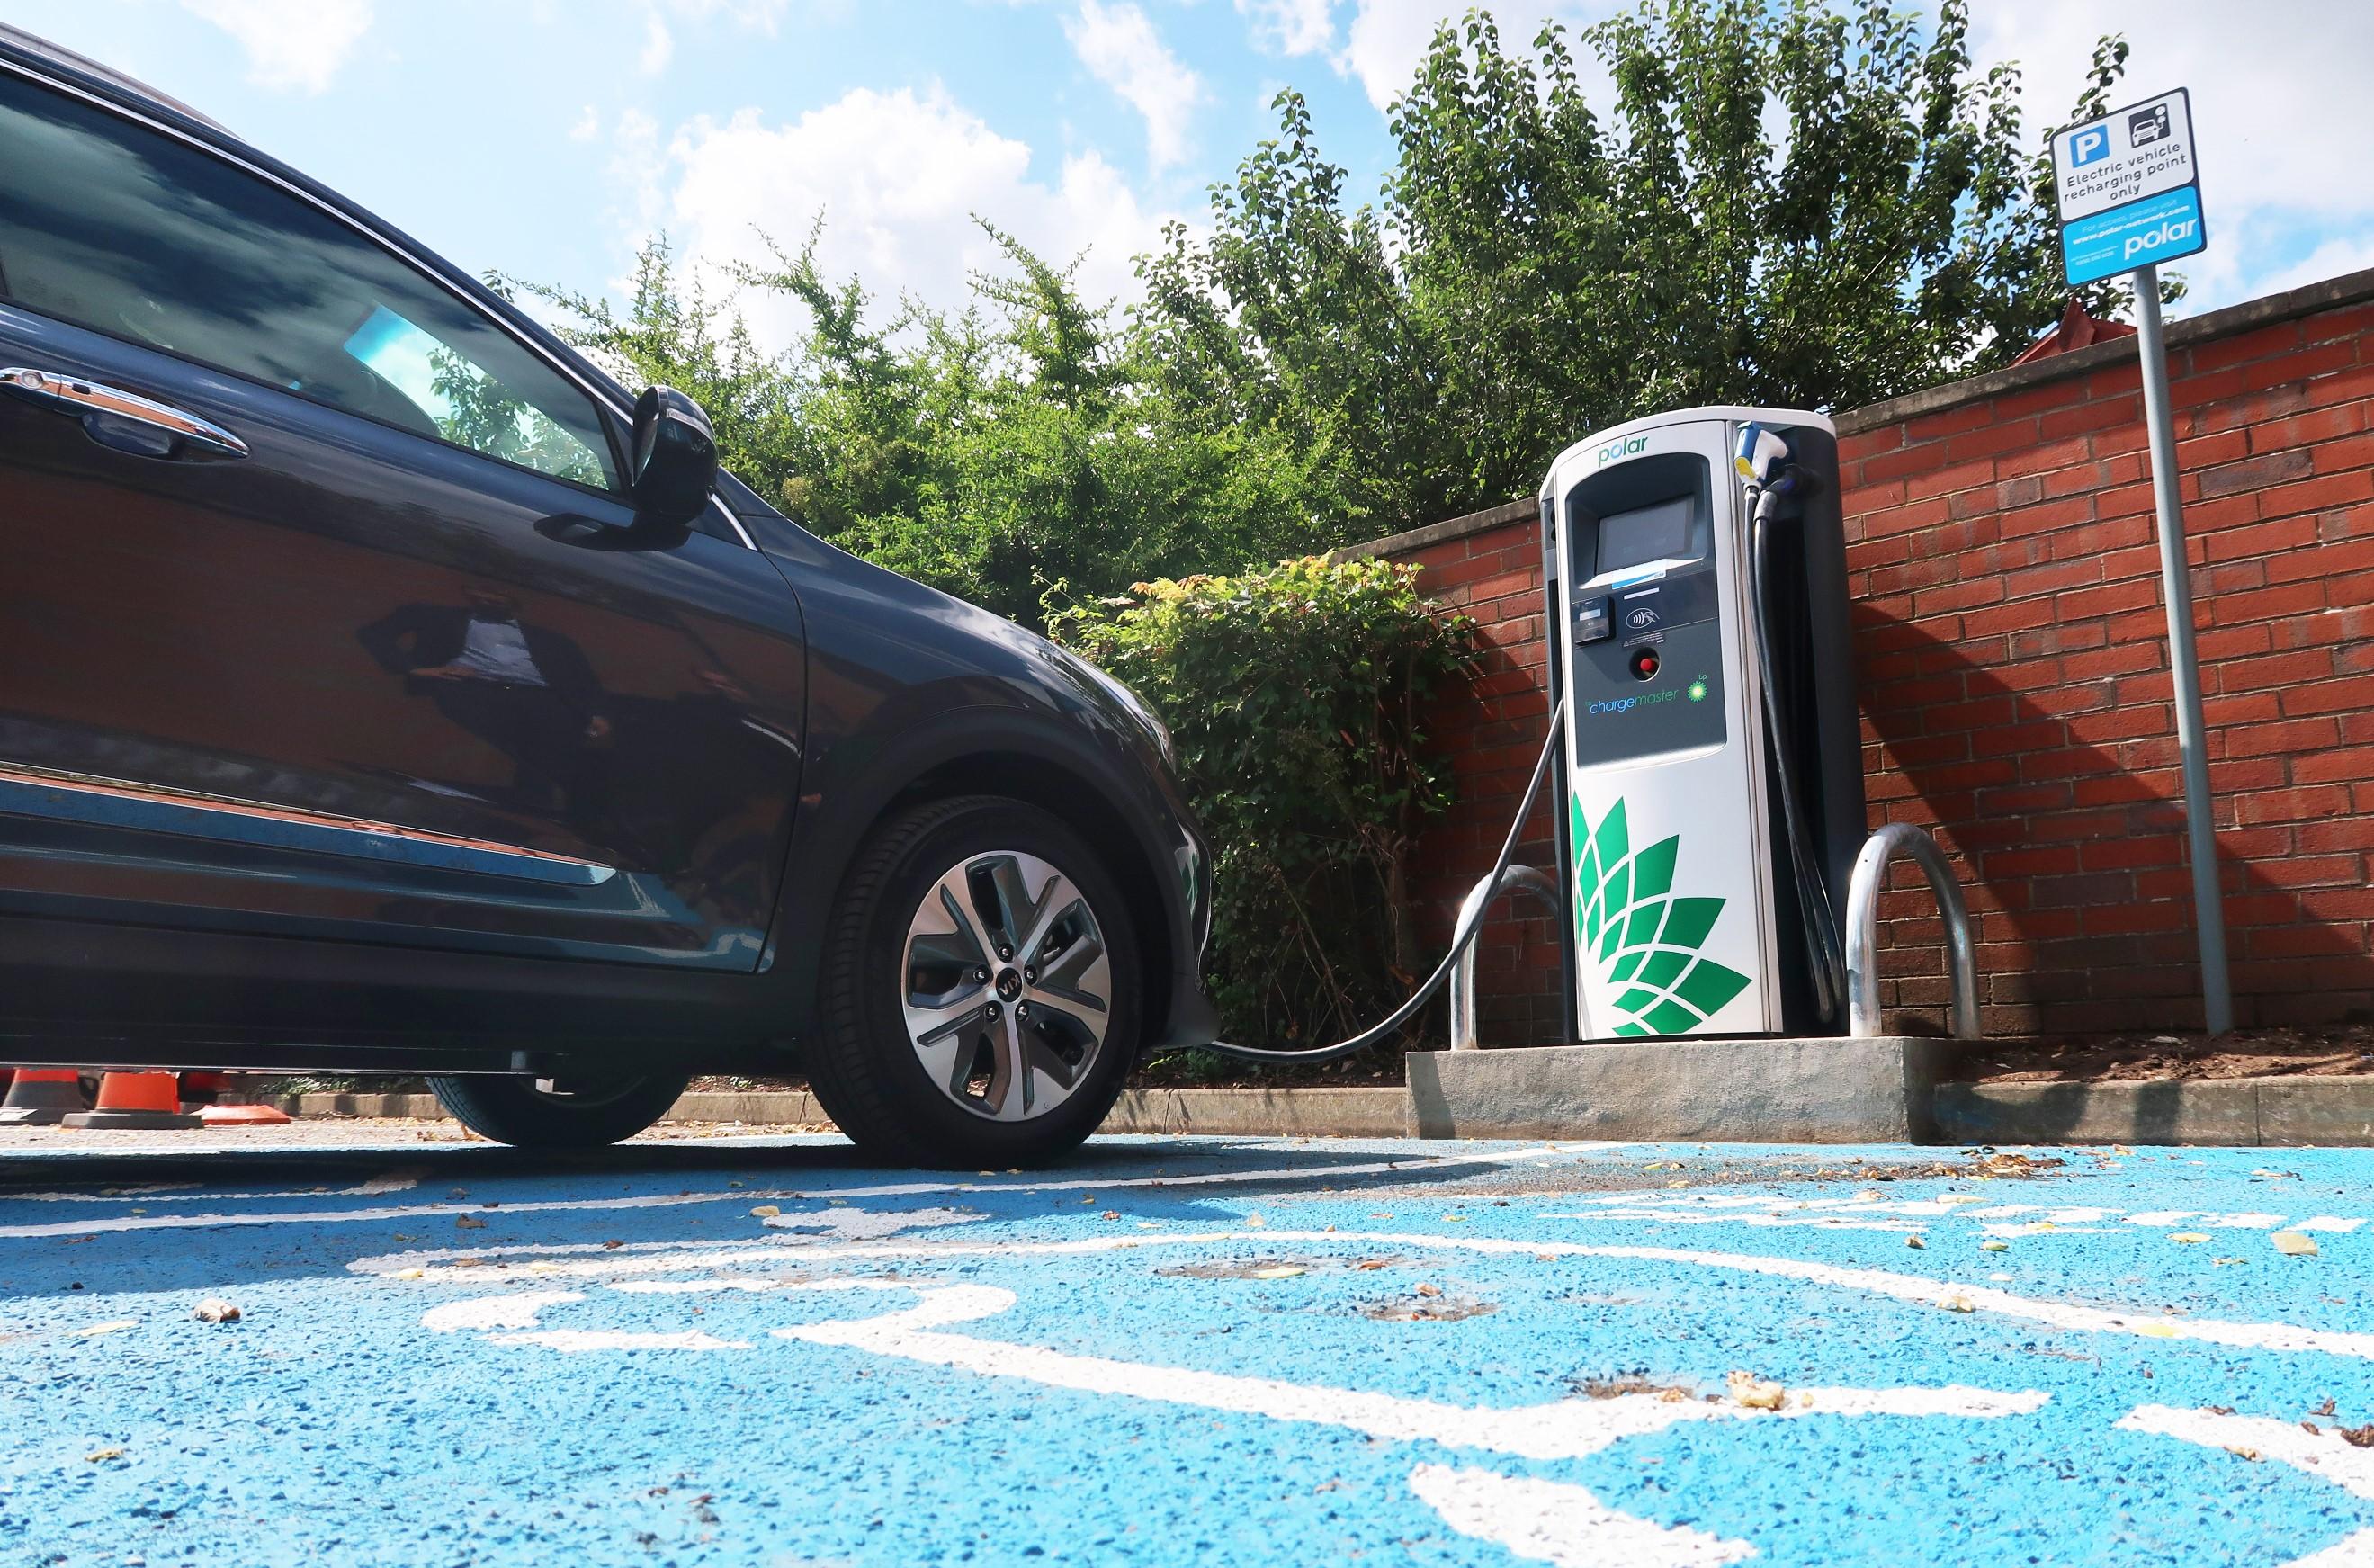 Bp Chargemaster Electric Vehicle Charging